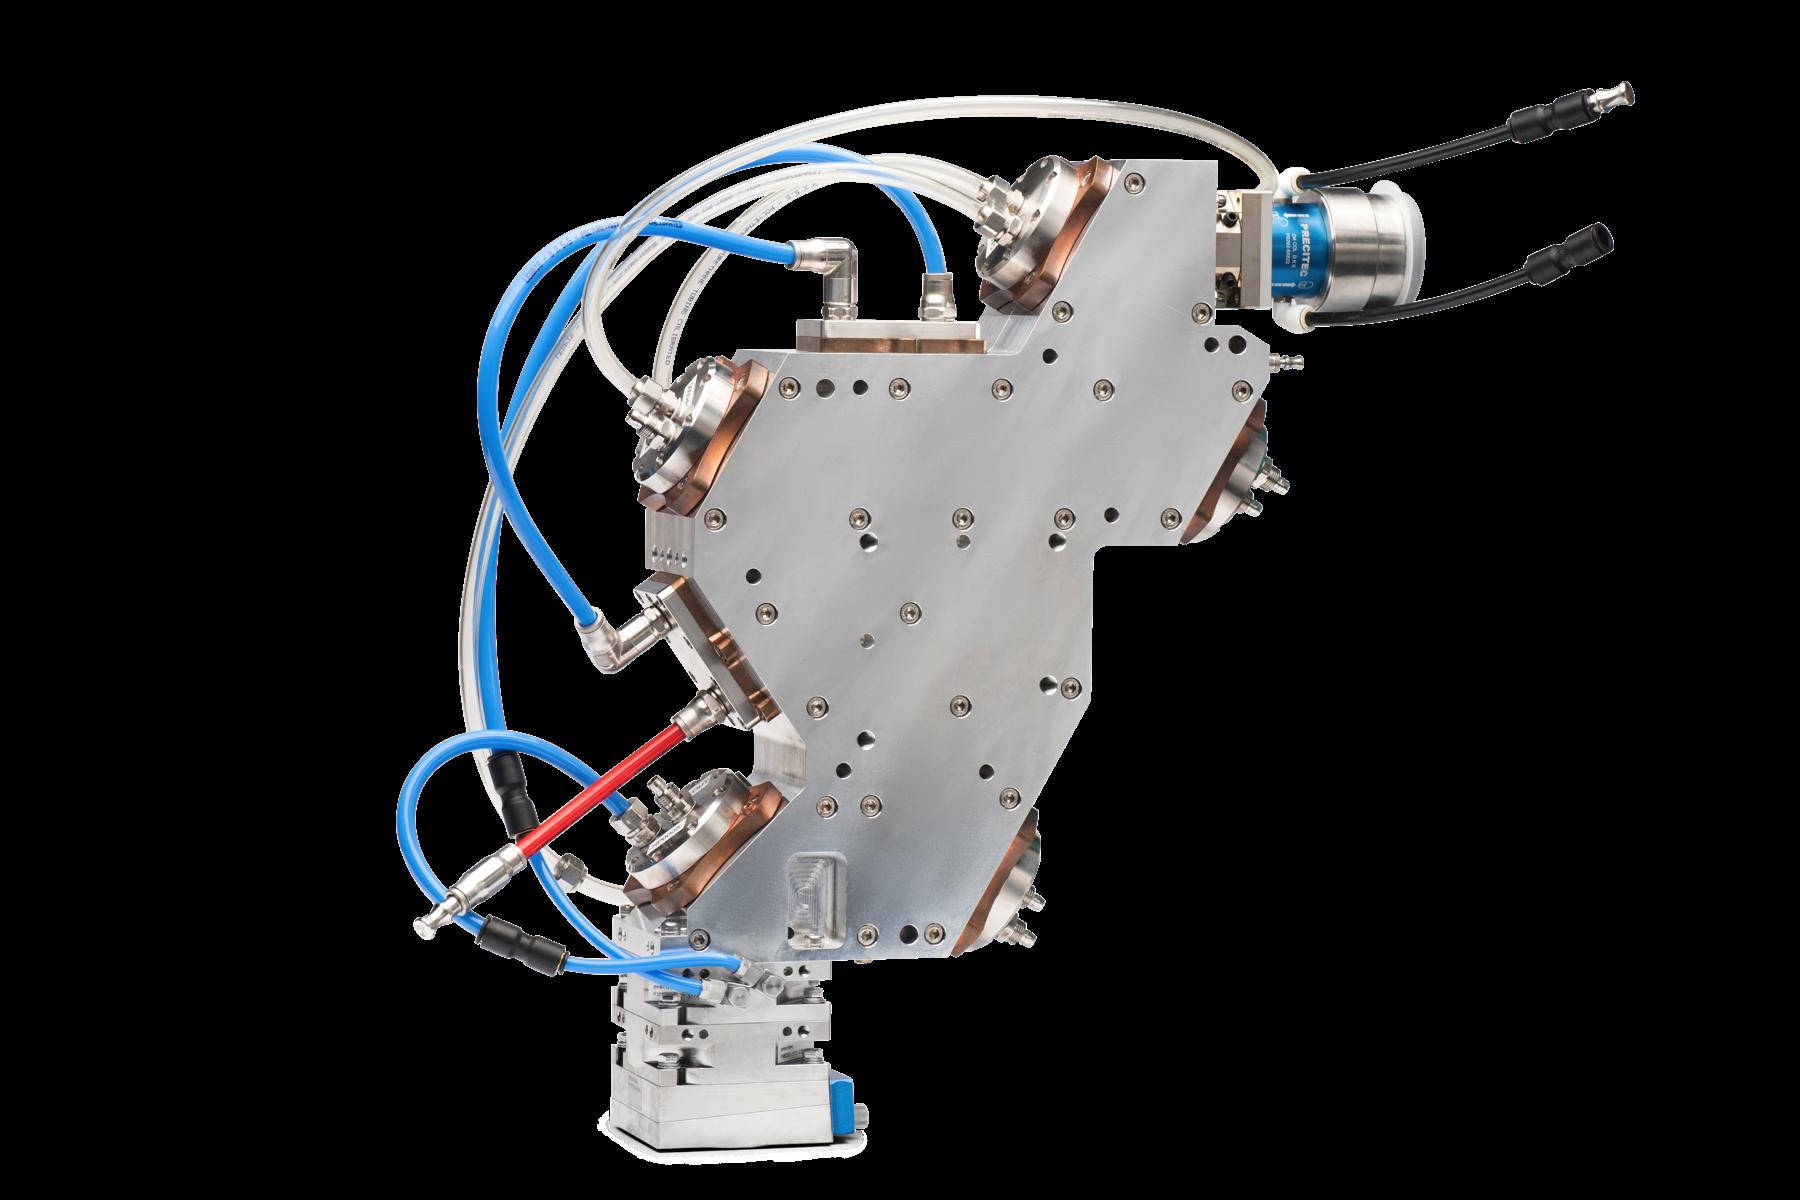 CANUNDA HP optics for beam shaping